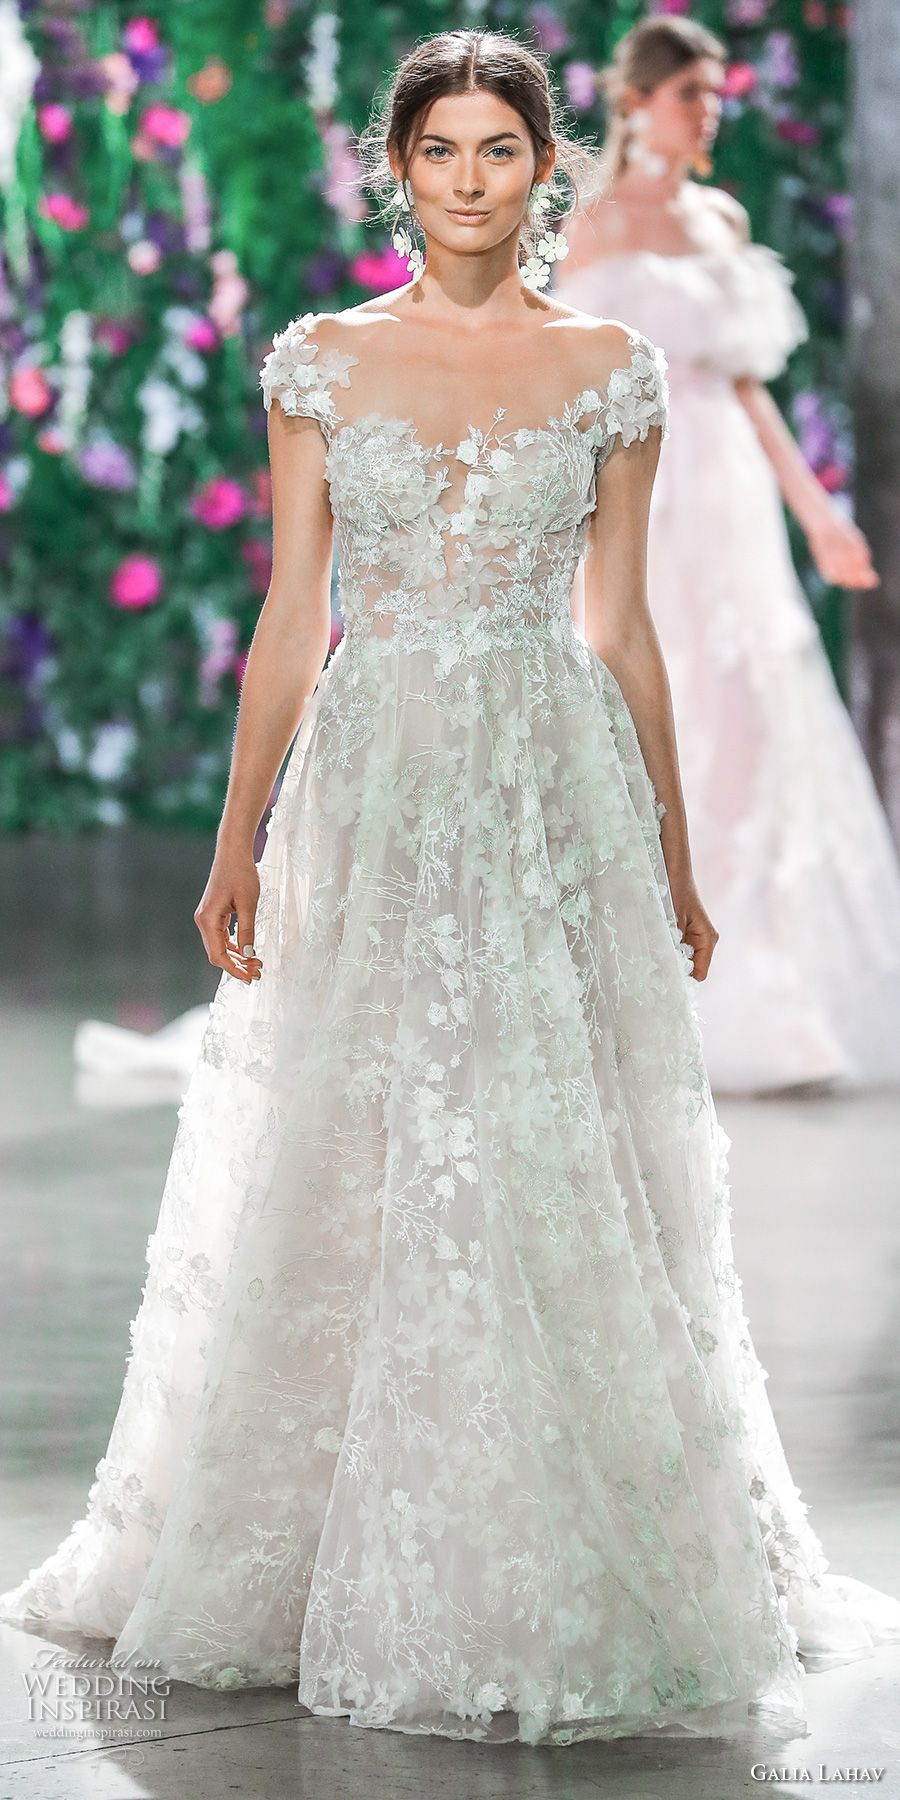 Galia lahav fall bridal cap sleeves sweetheart neckline full